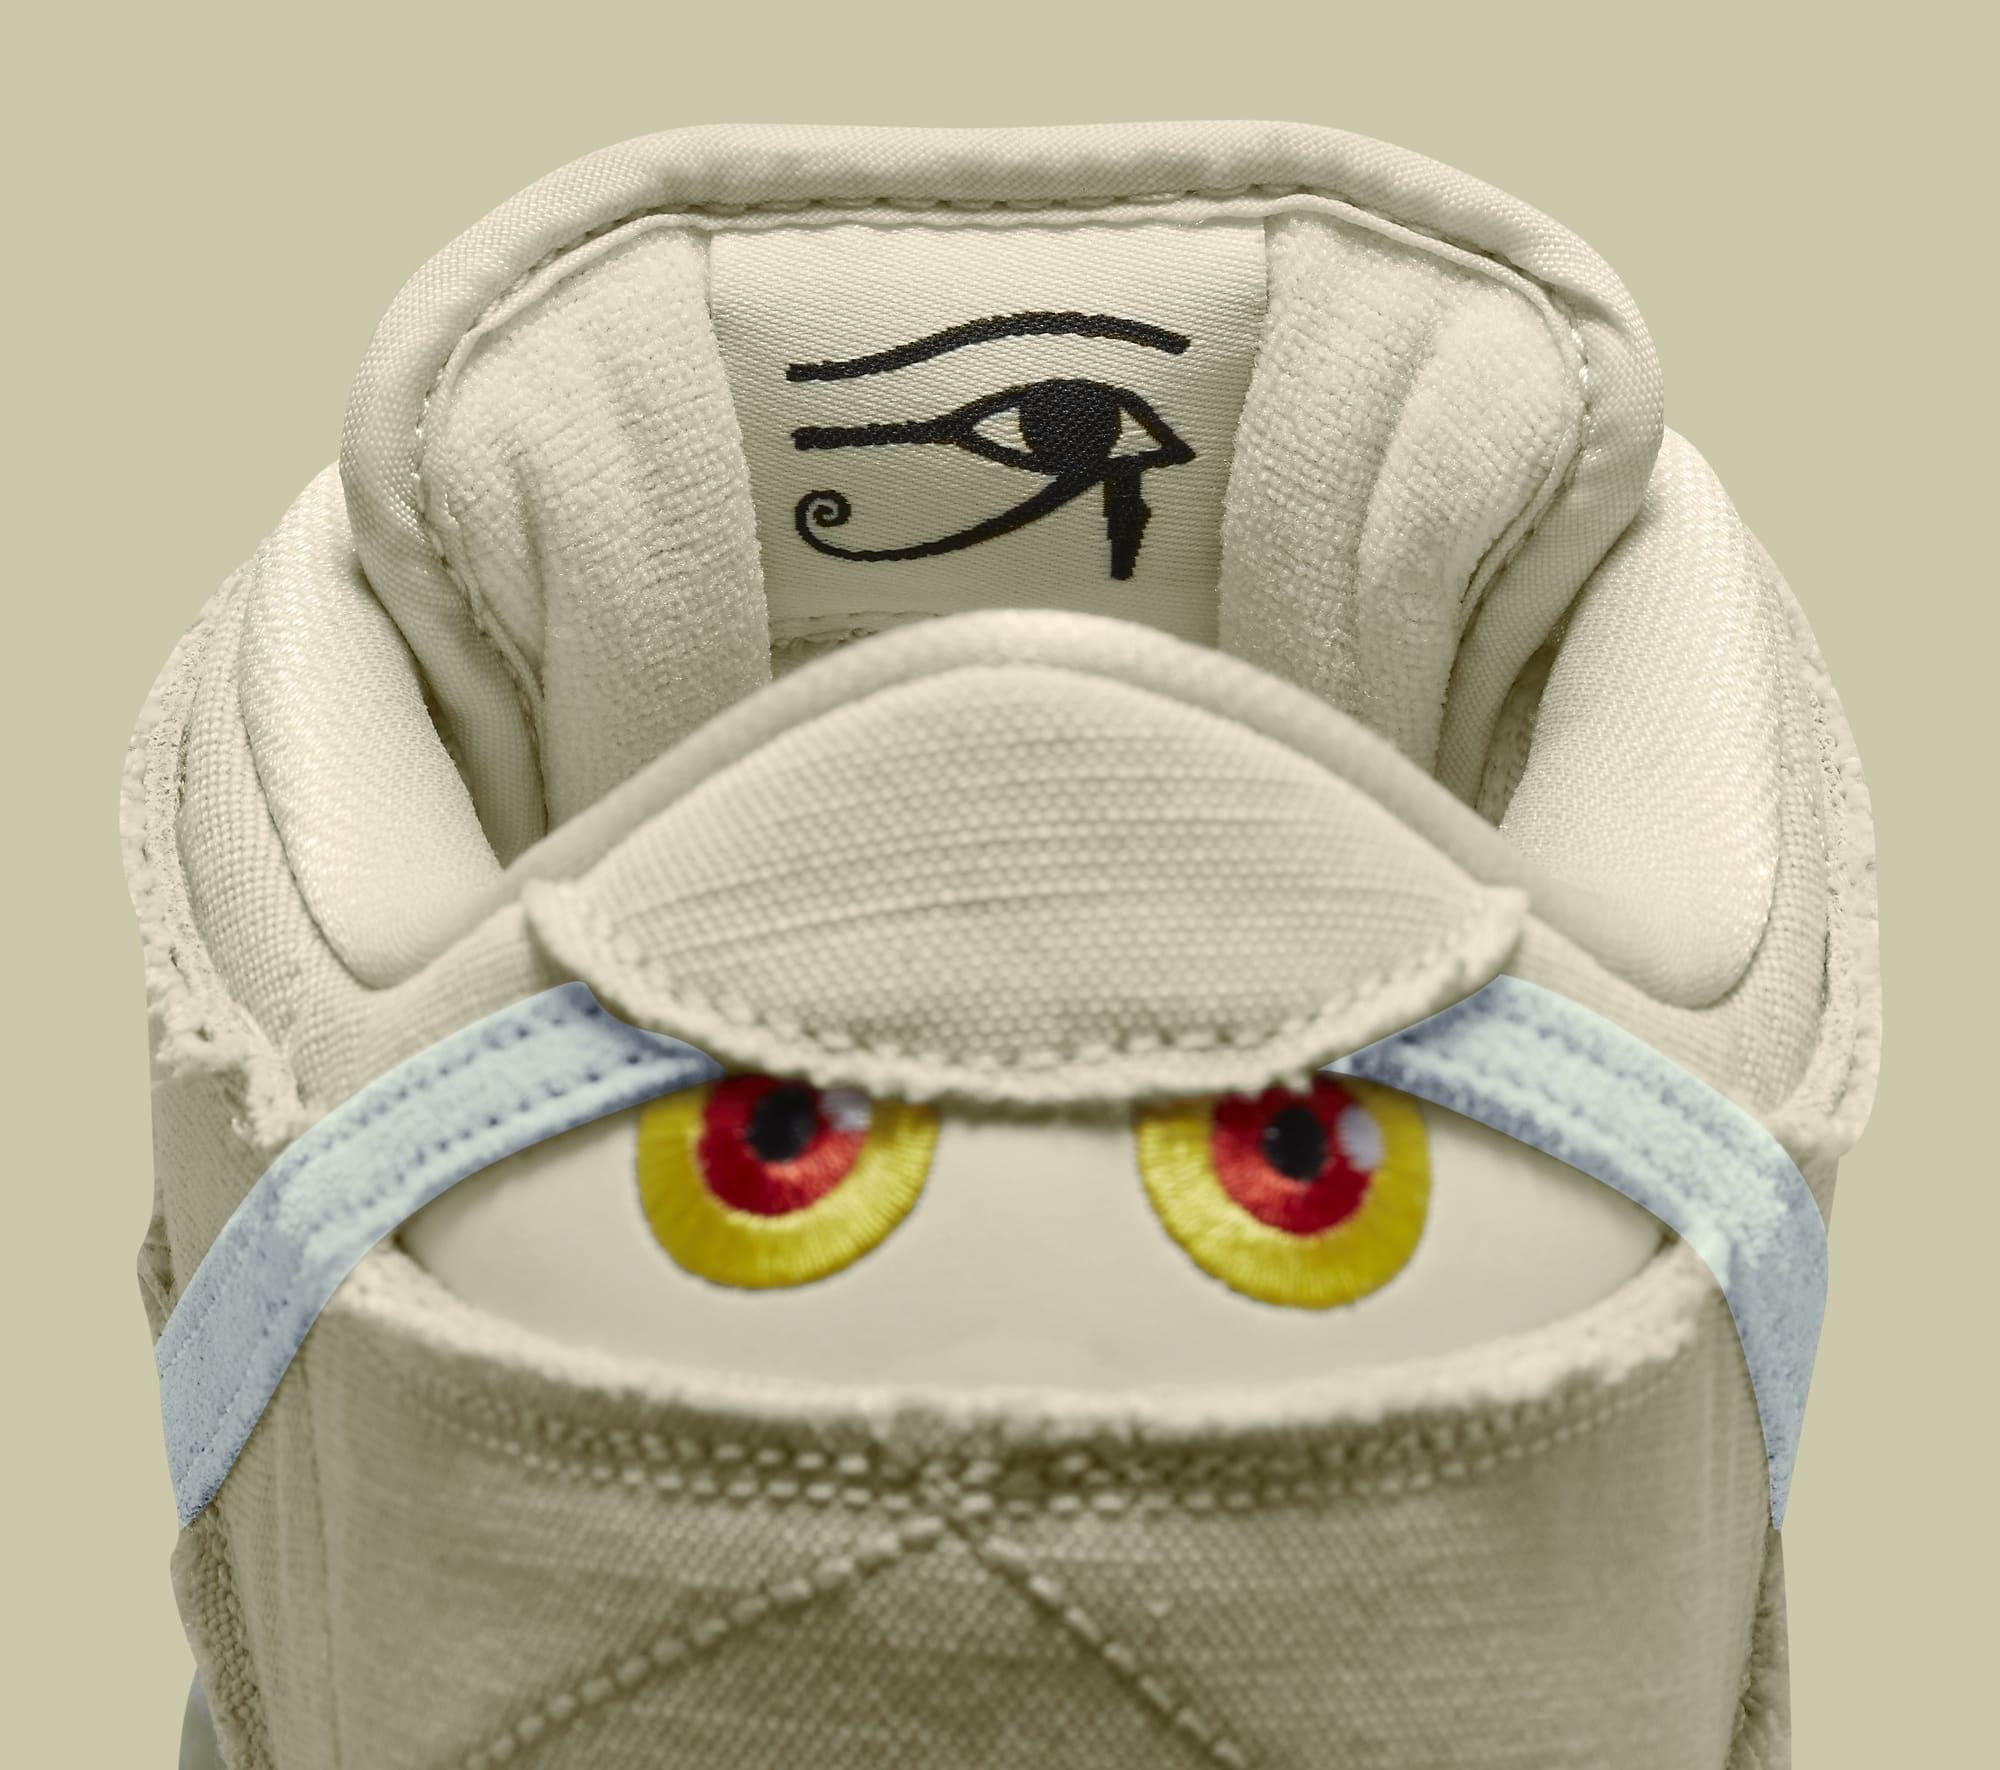 Nike SB Dunk Low 'Mummy' DM0774-111 Tongue